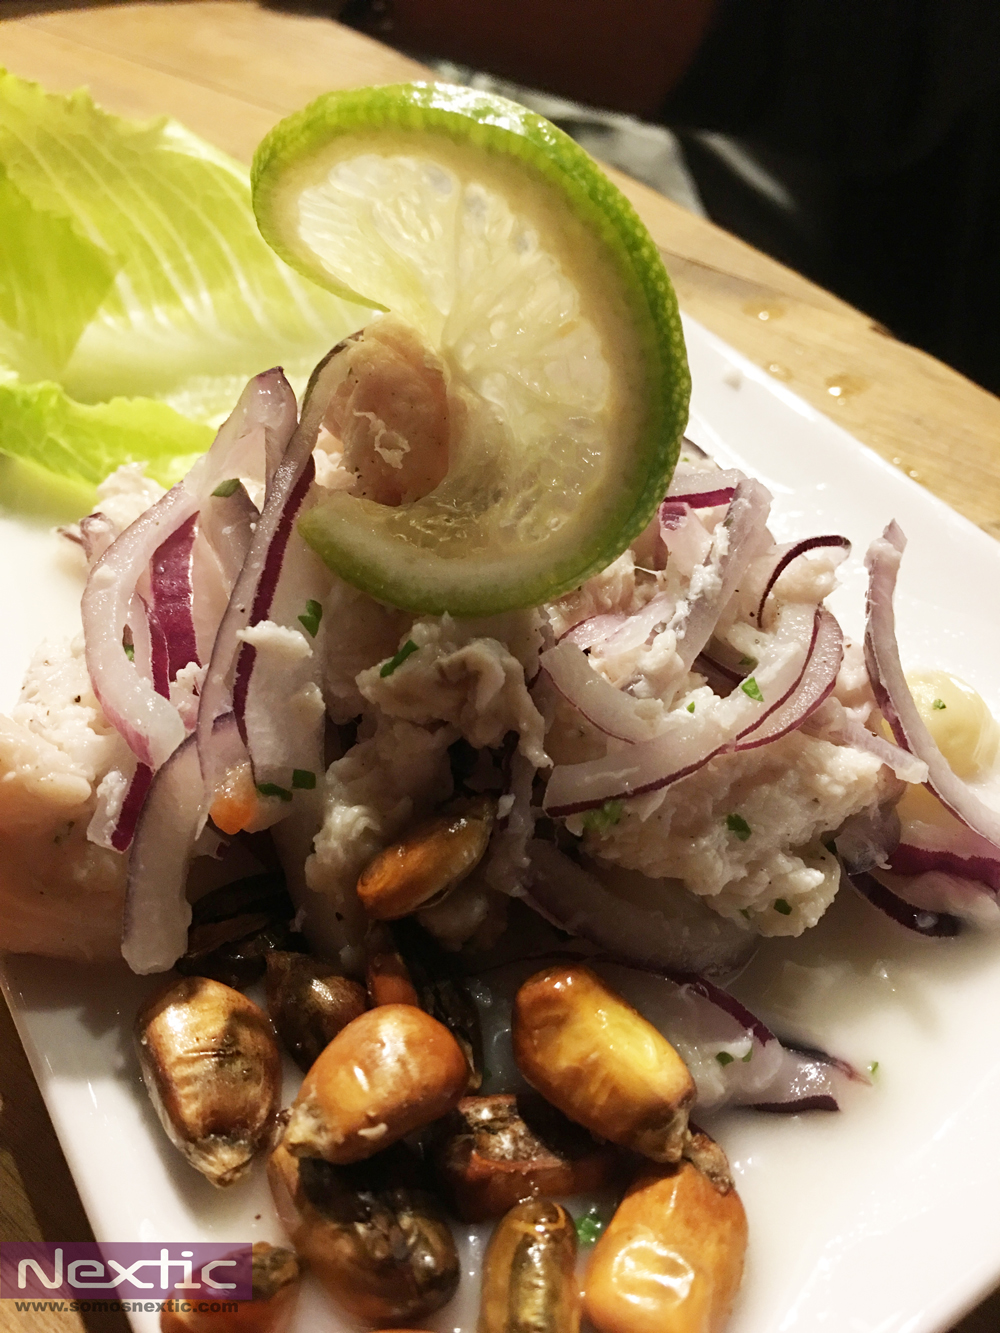 malamar-gastronomia-restaurante-nextic-manu-nunez-6